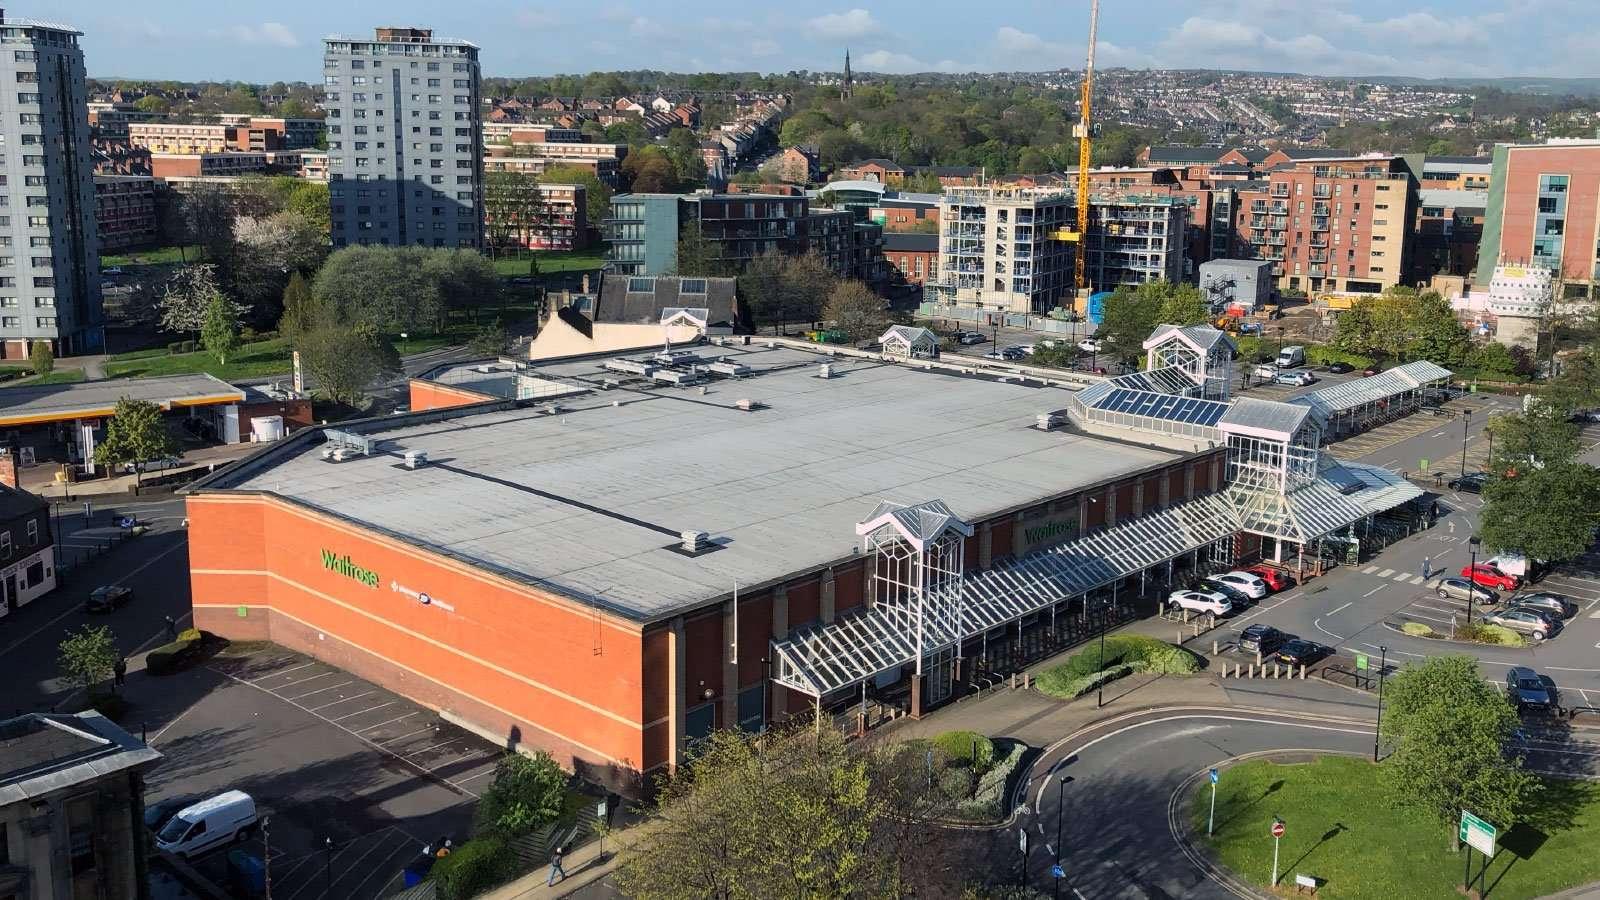 Waitrose & Partners (John Lewis & Partners), Ecclesall Road, Sheffield